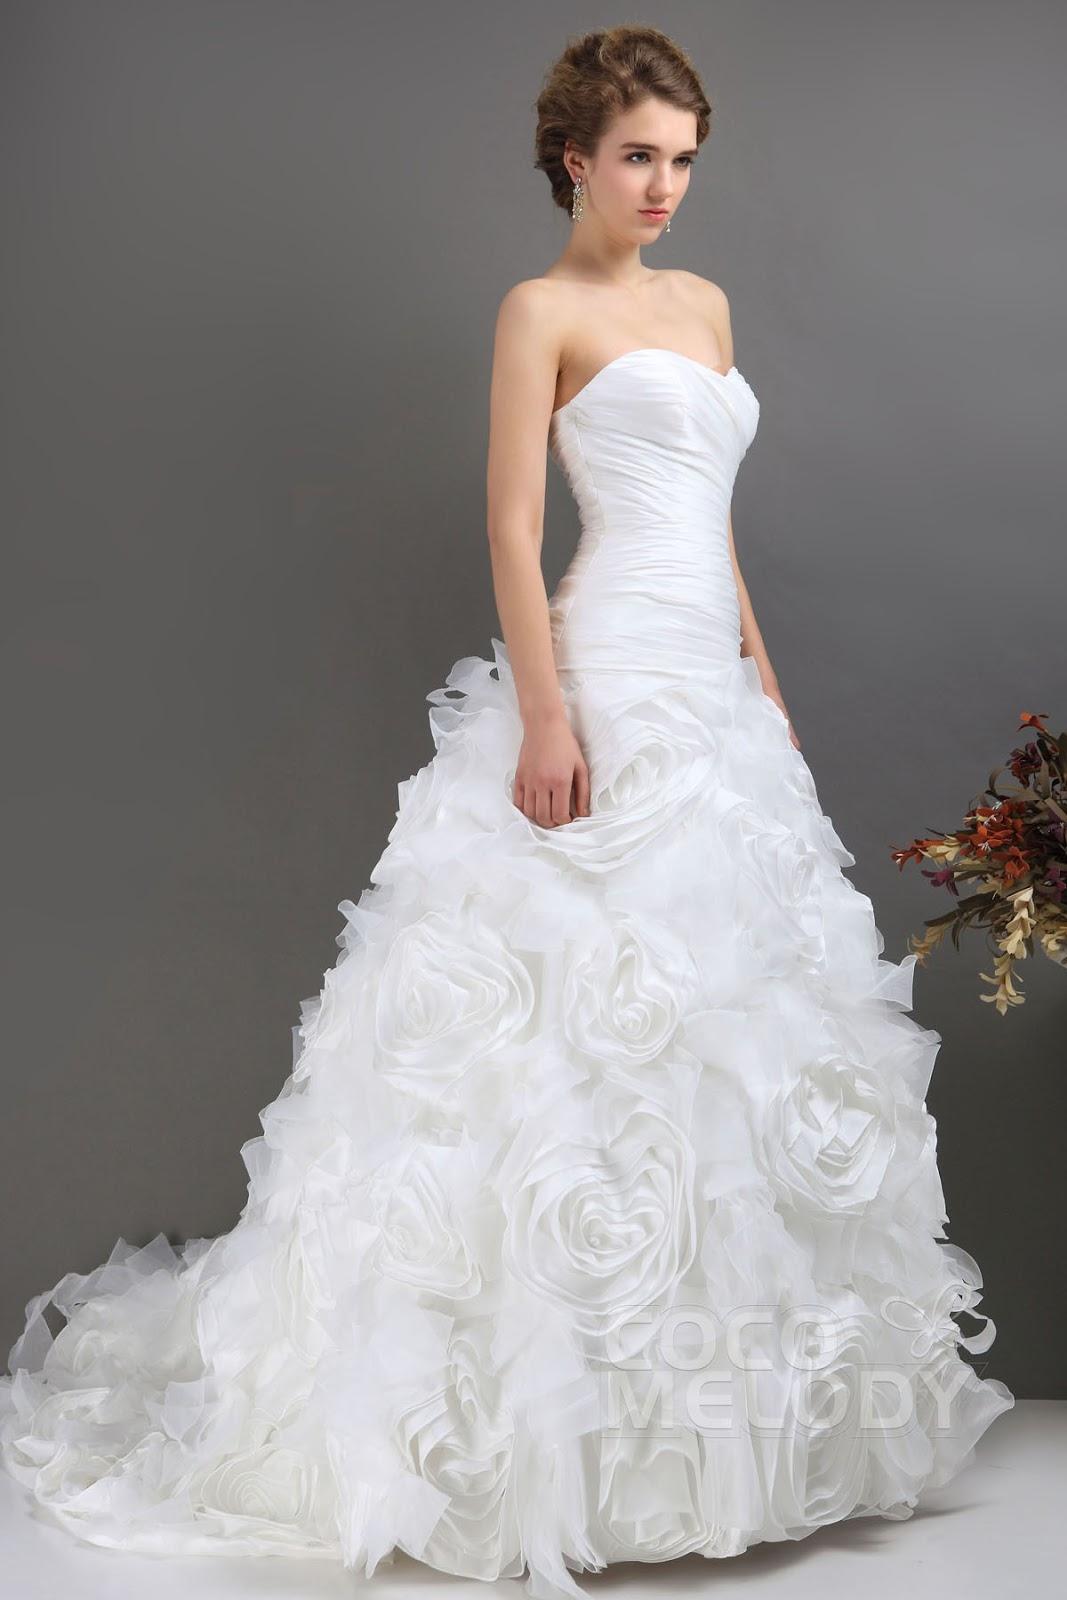 princess flower girl dresses: How to pick wedding dresses ...